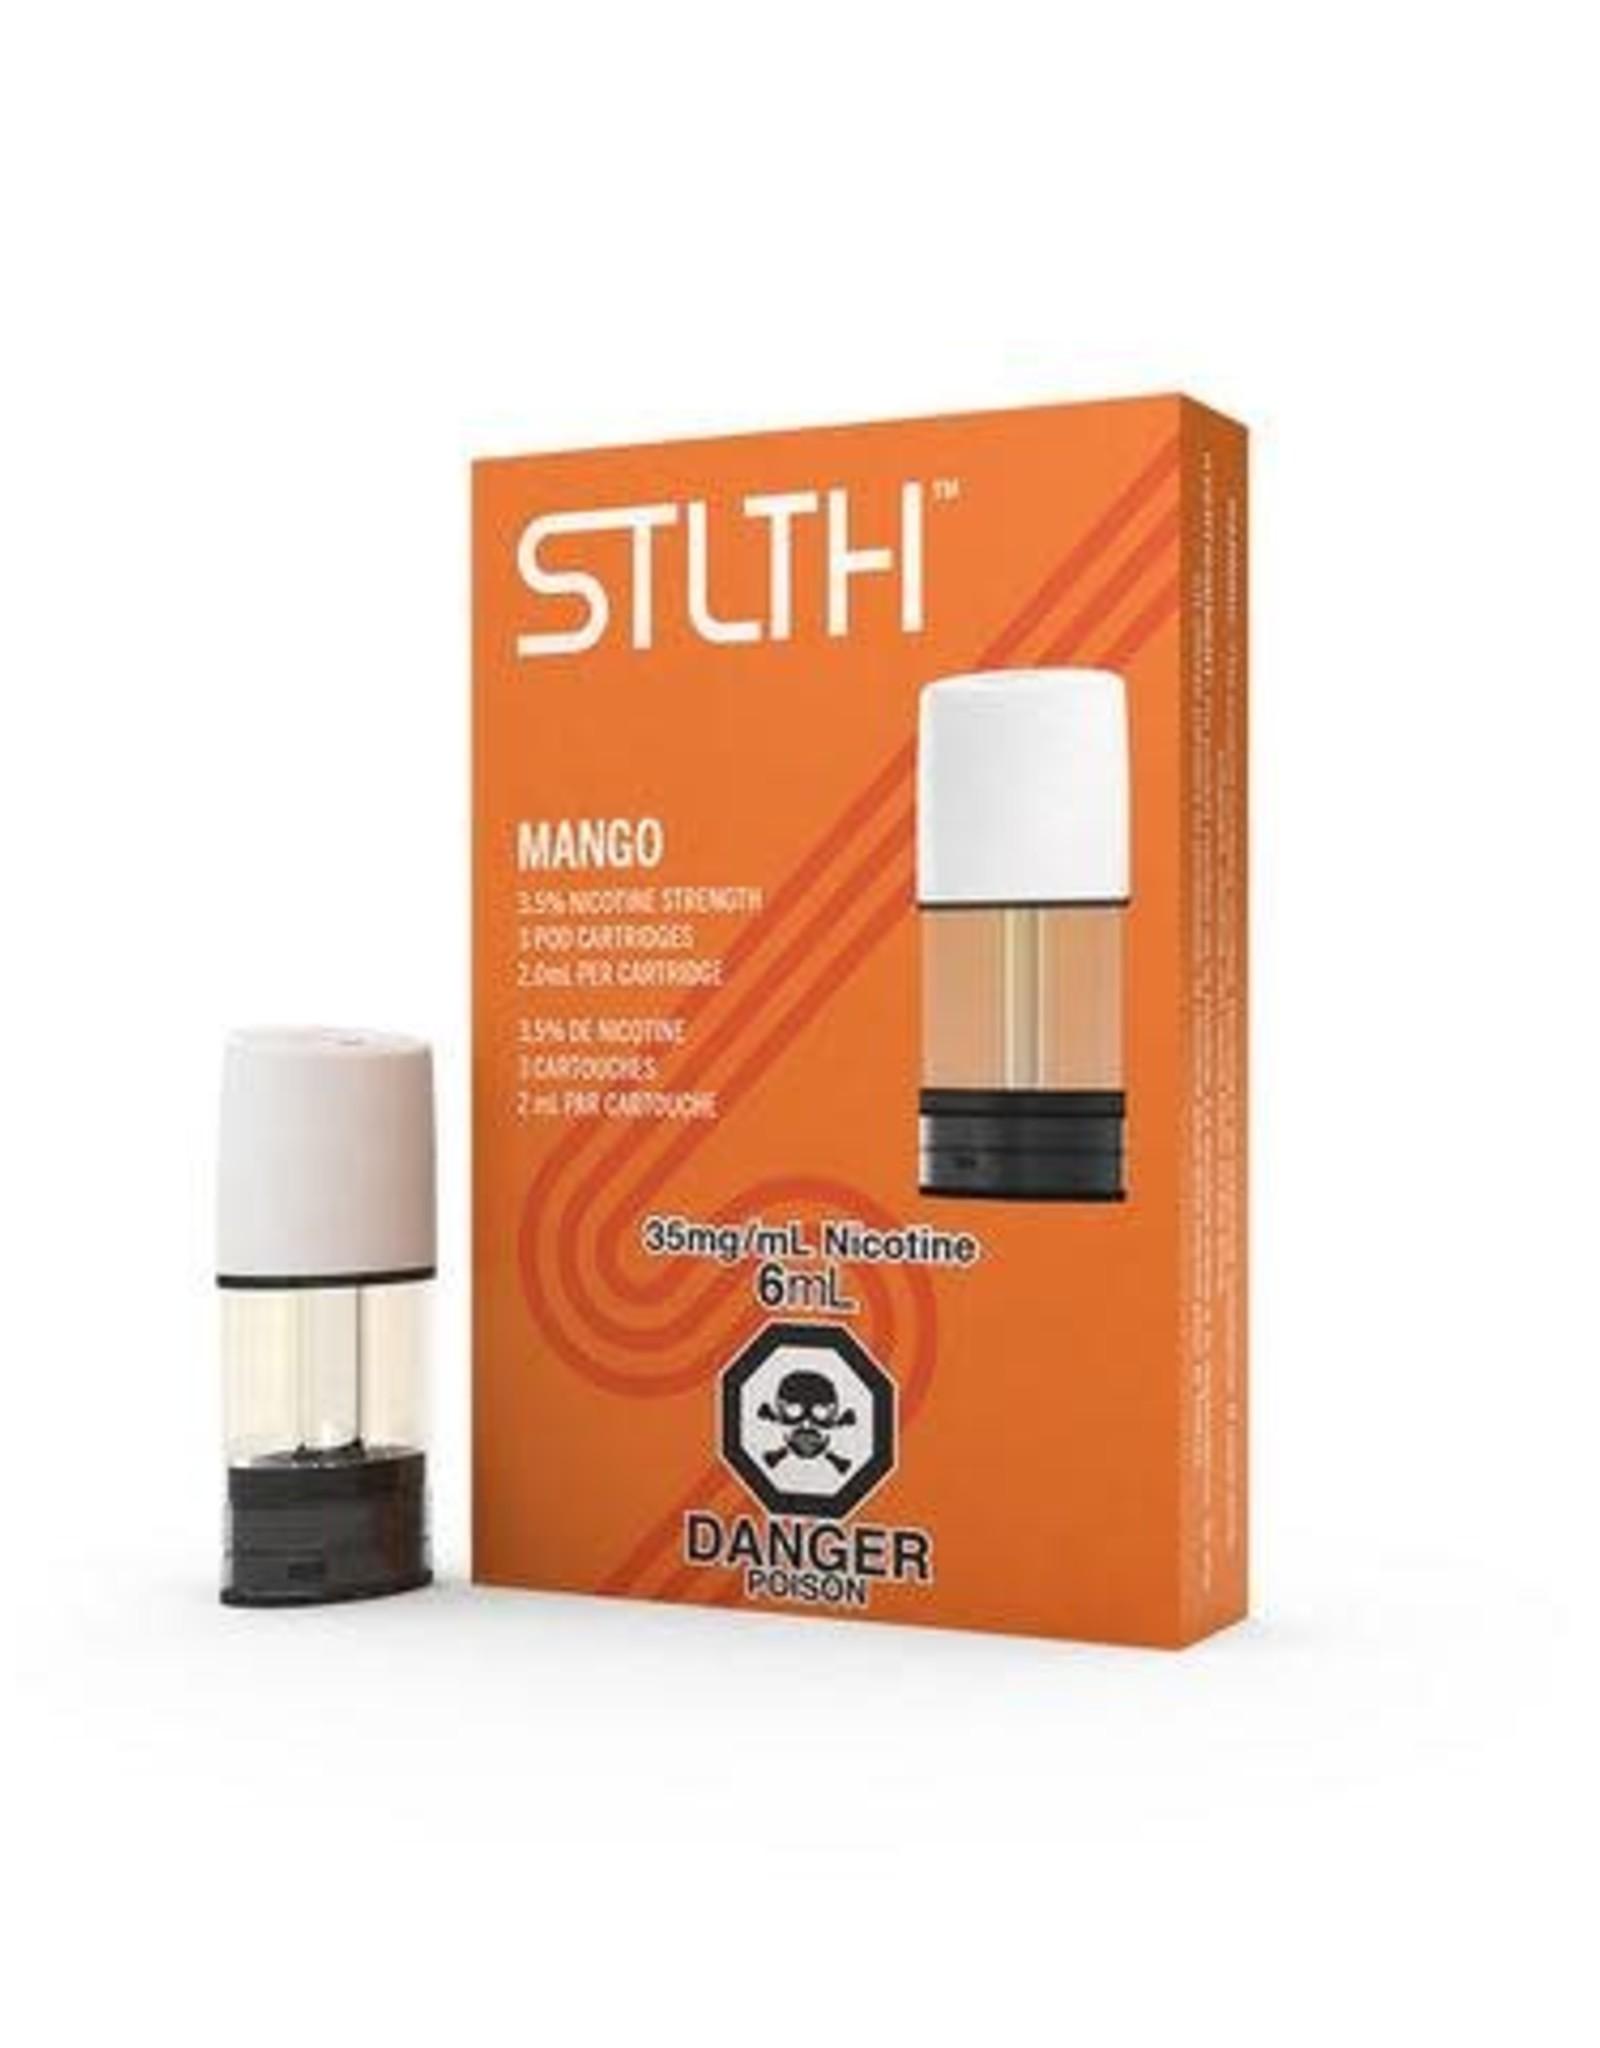 STLTH POD PACK MANGO (50mg 1 pod)